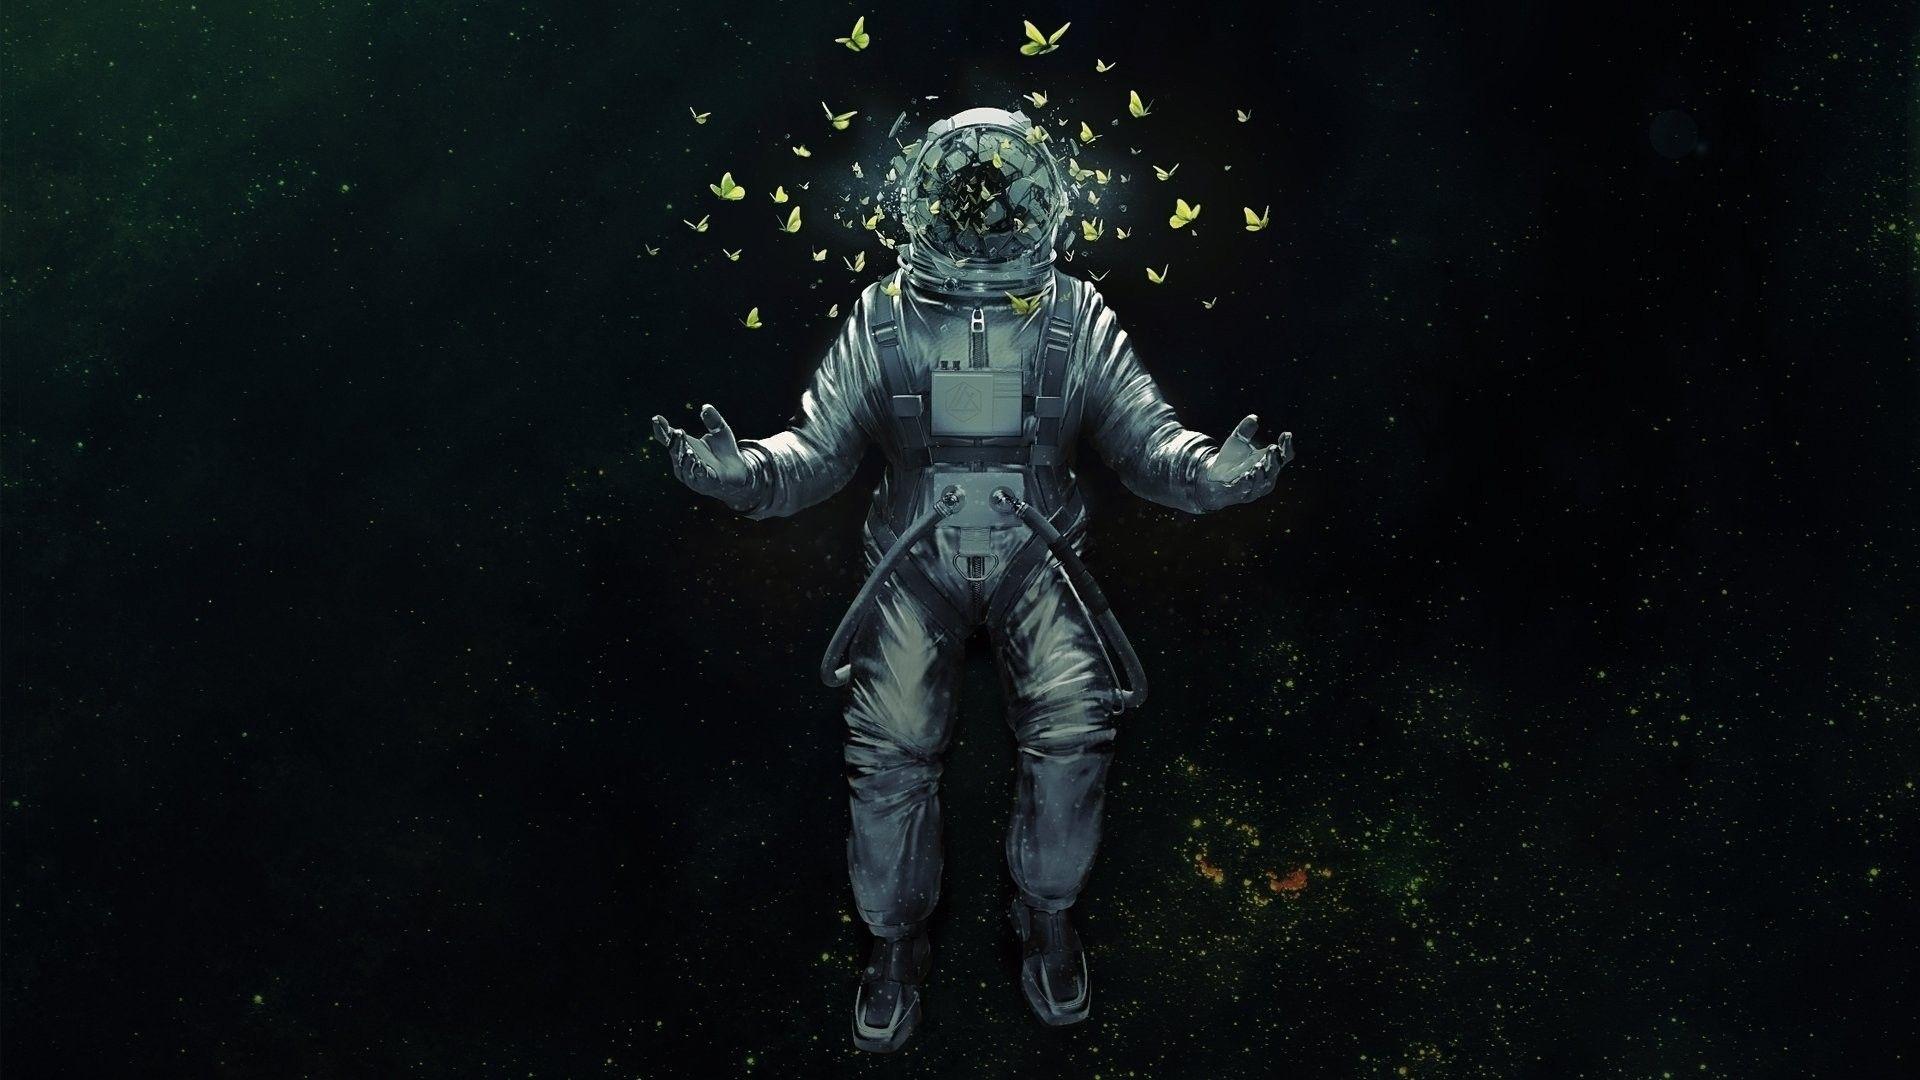 General 1920x1080 astronaut butterfly Psy